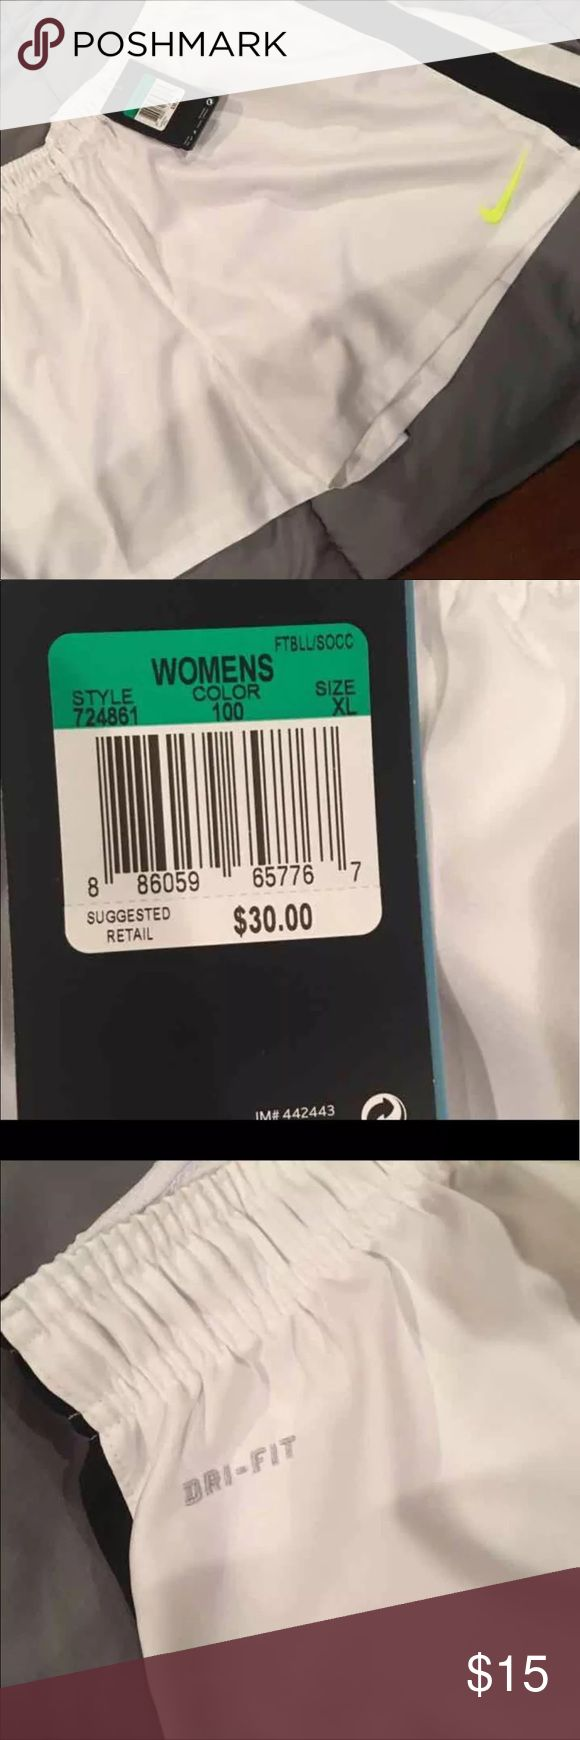 NWT Soccer Tennis Shorts White Nike DriFit New With Tags DriFit White Nike Shorts. Brand New $30. Fast Shipping. Nike Shorts